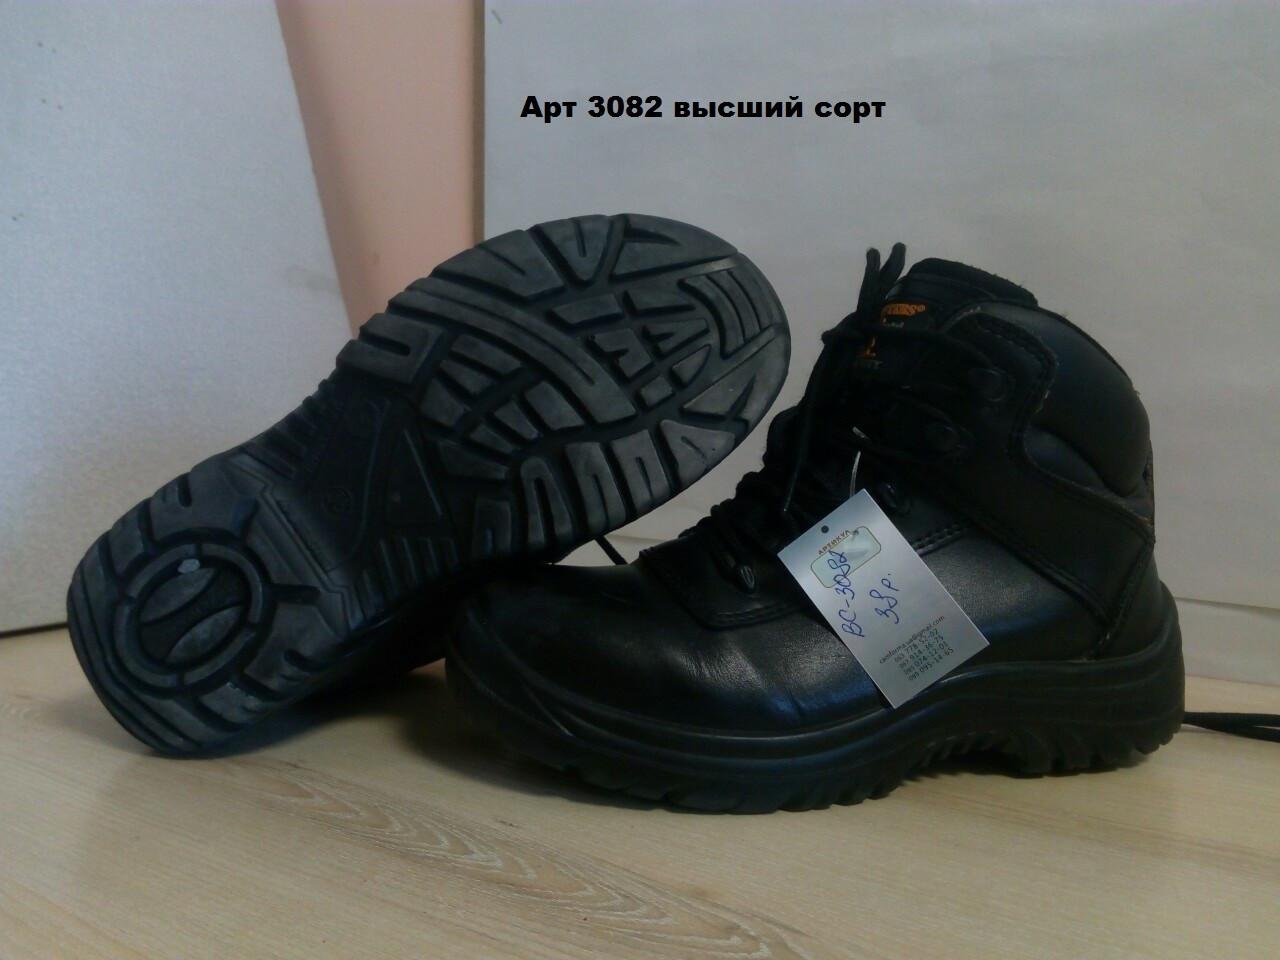 Ботинки Crafters оригинал Британия БУ Высший сорт